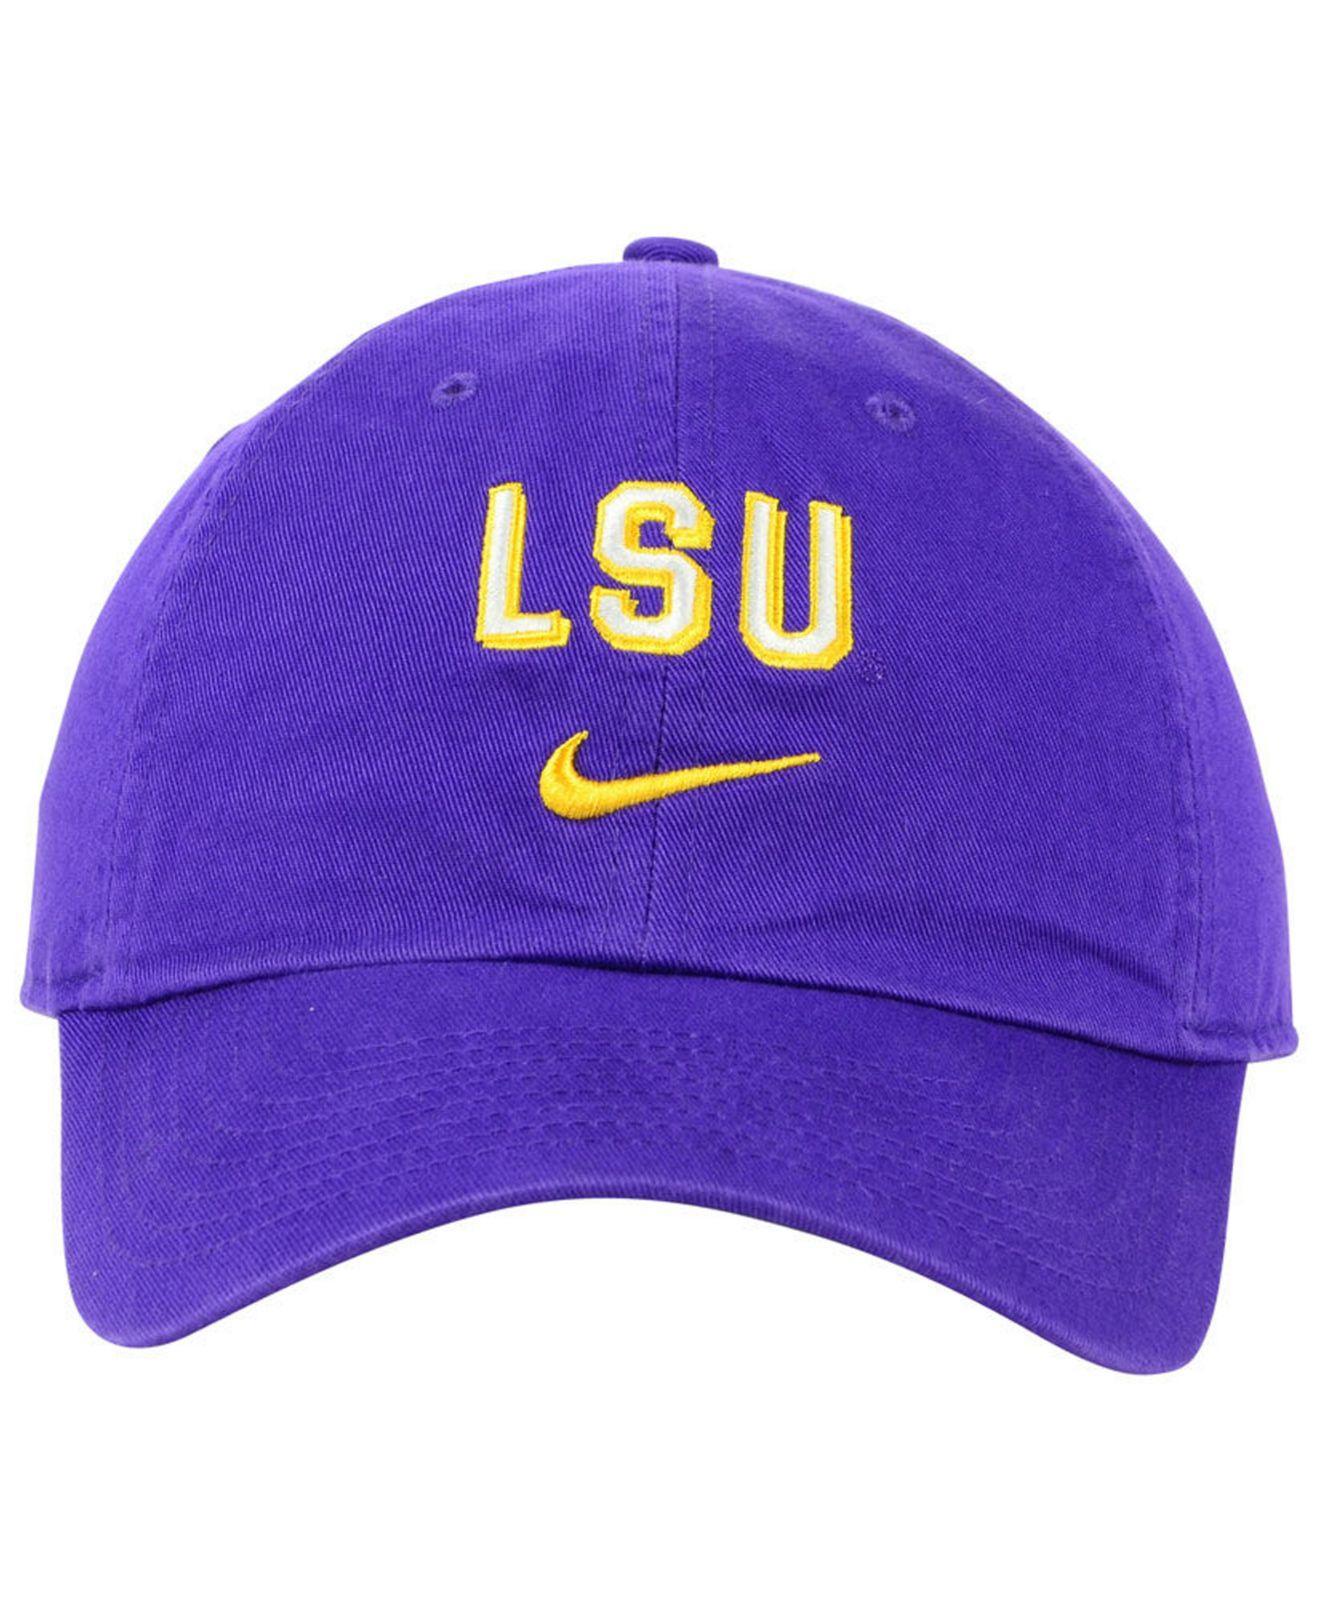 new products 06d49 4e408 Nike - Purple Lsu Tigers H86 Wordmark Swoosh Cap for Men - Lyst. View  fullscreen